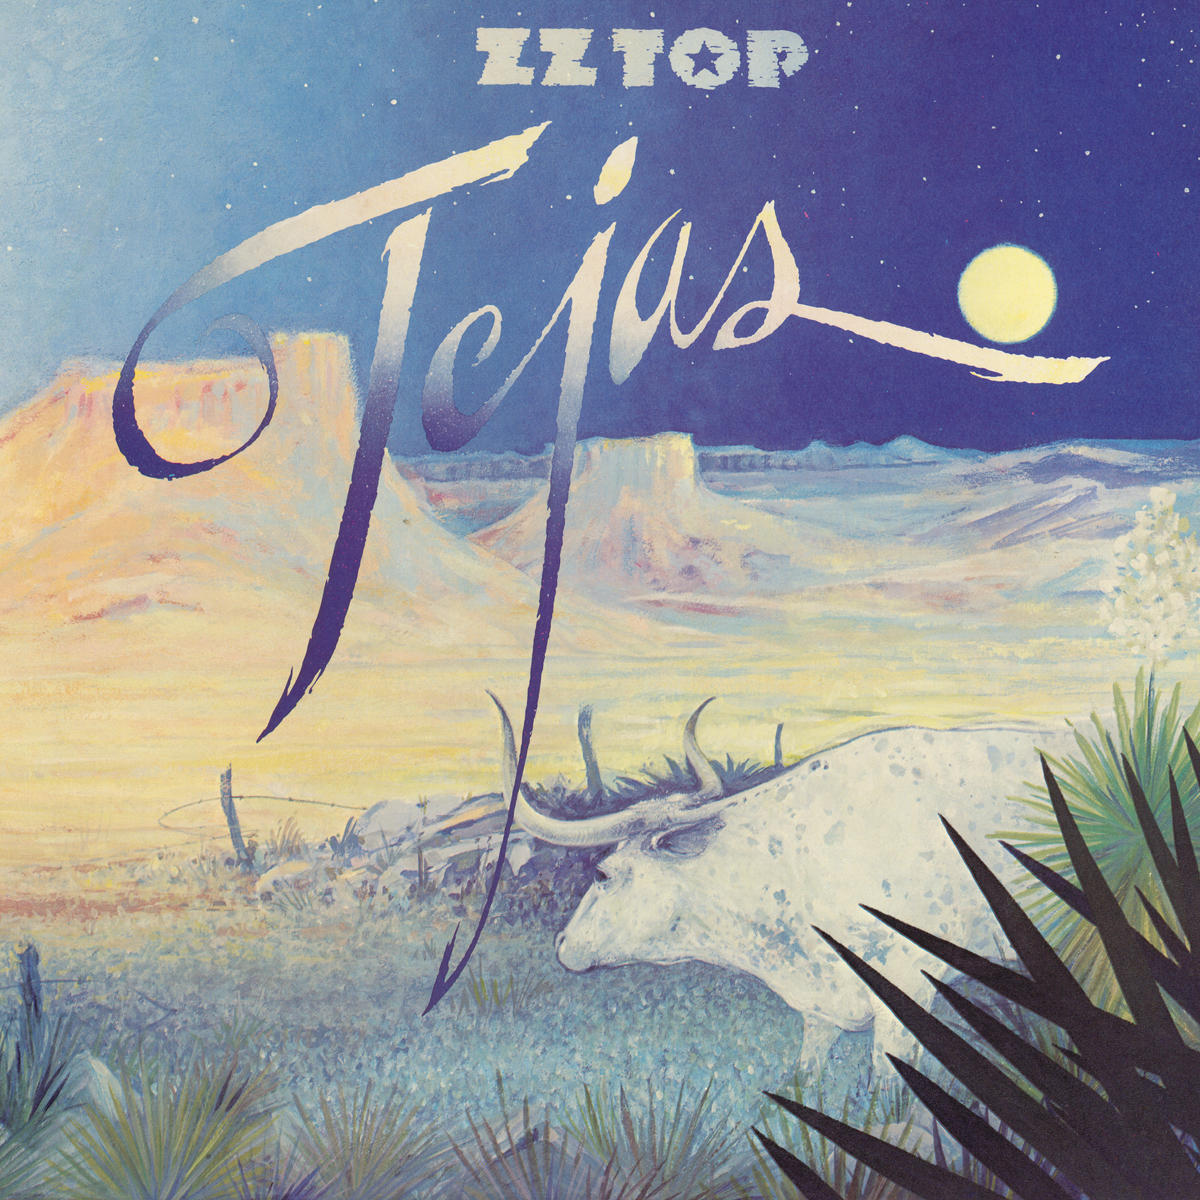 ZZ Top ZZ Top. Tejas (LP) zz top zz top greatest hits